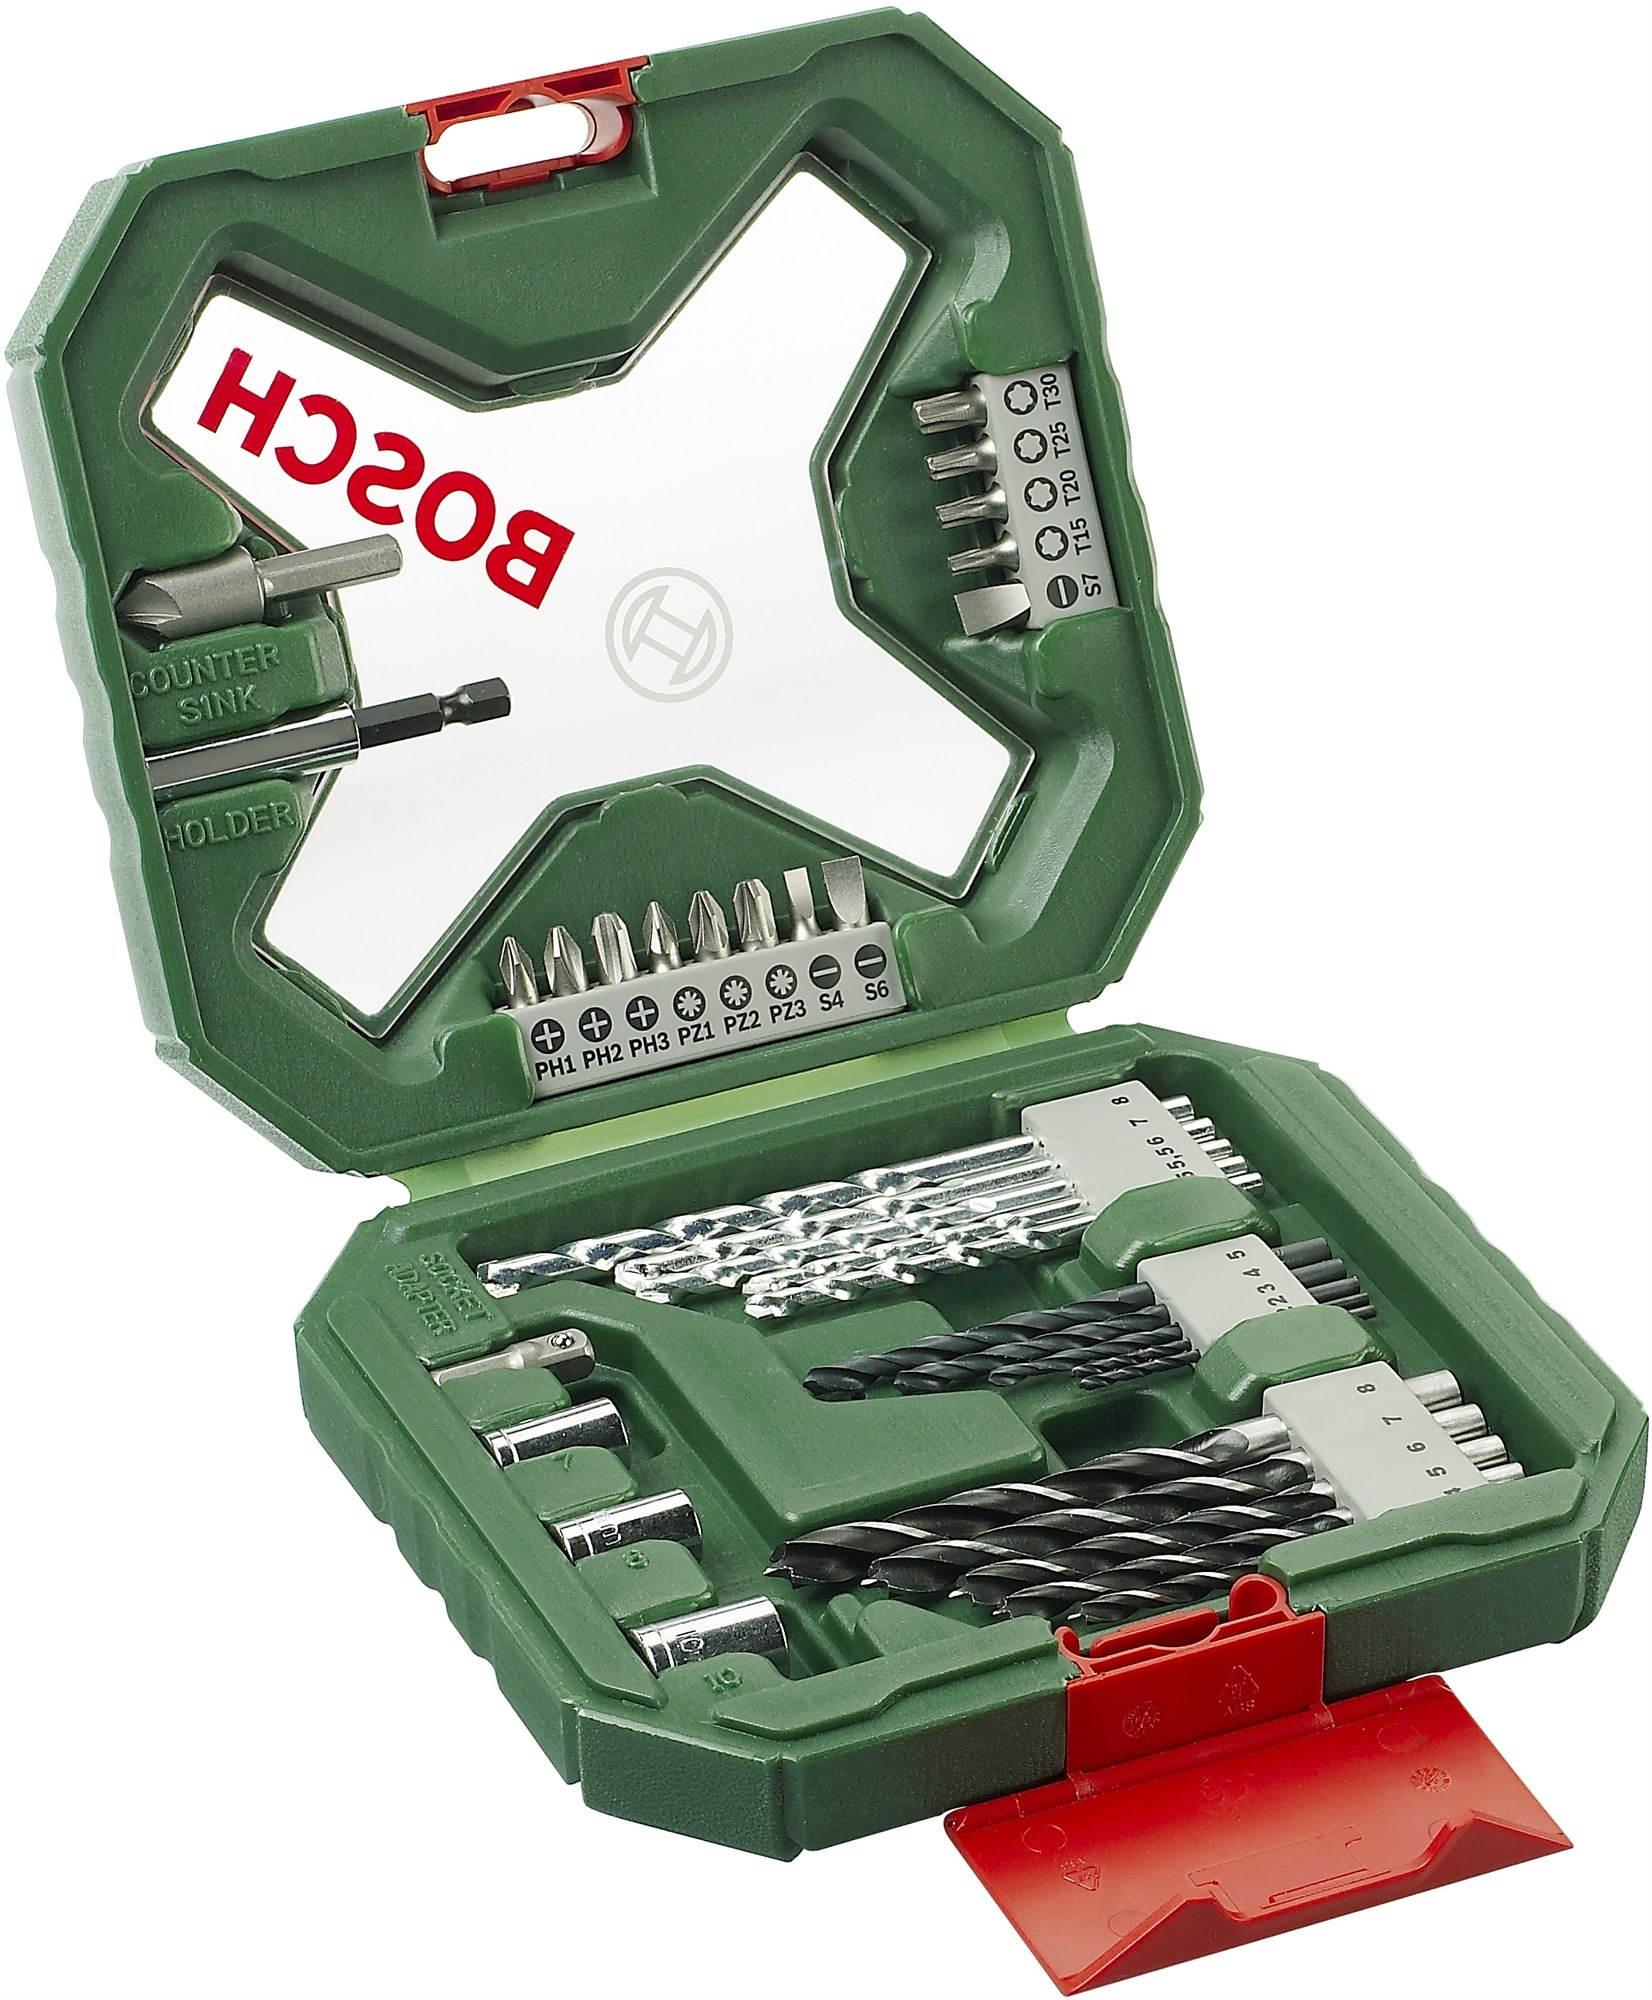 Bosch X-line Classic